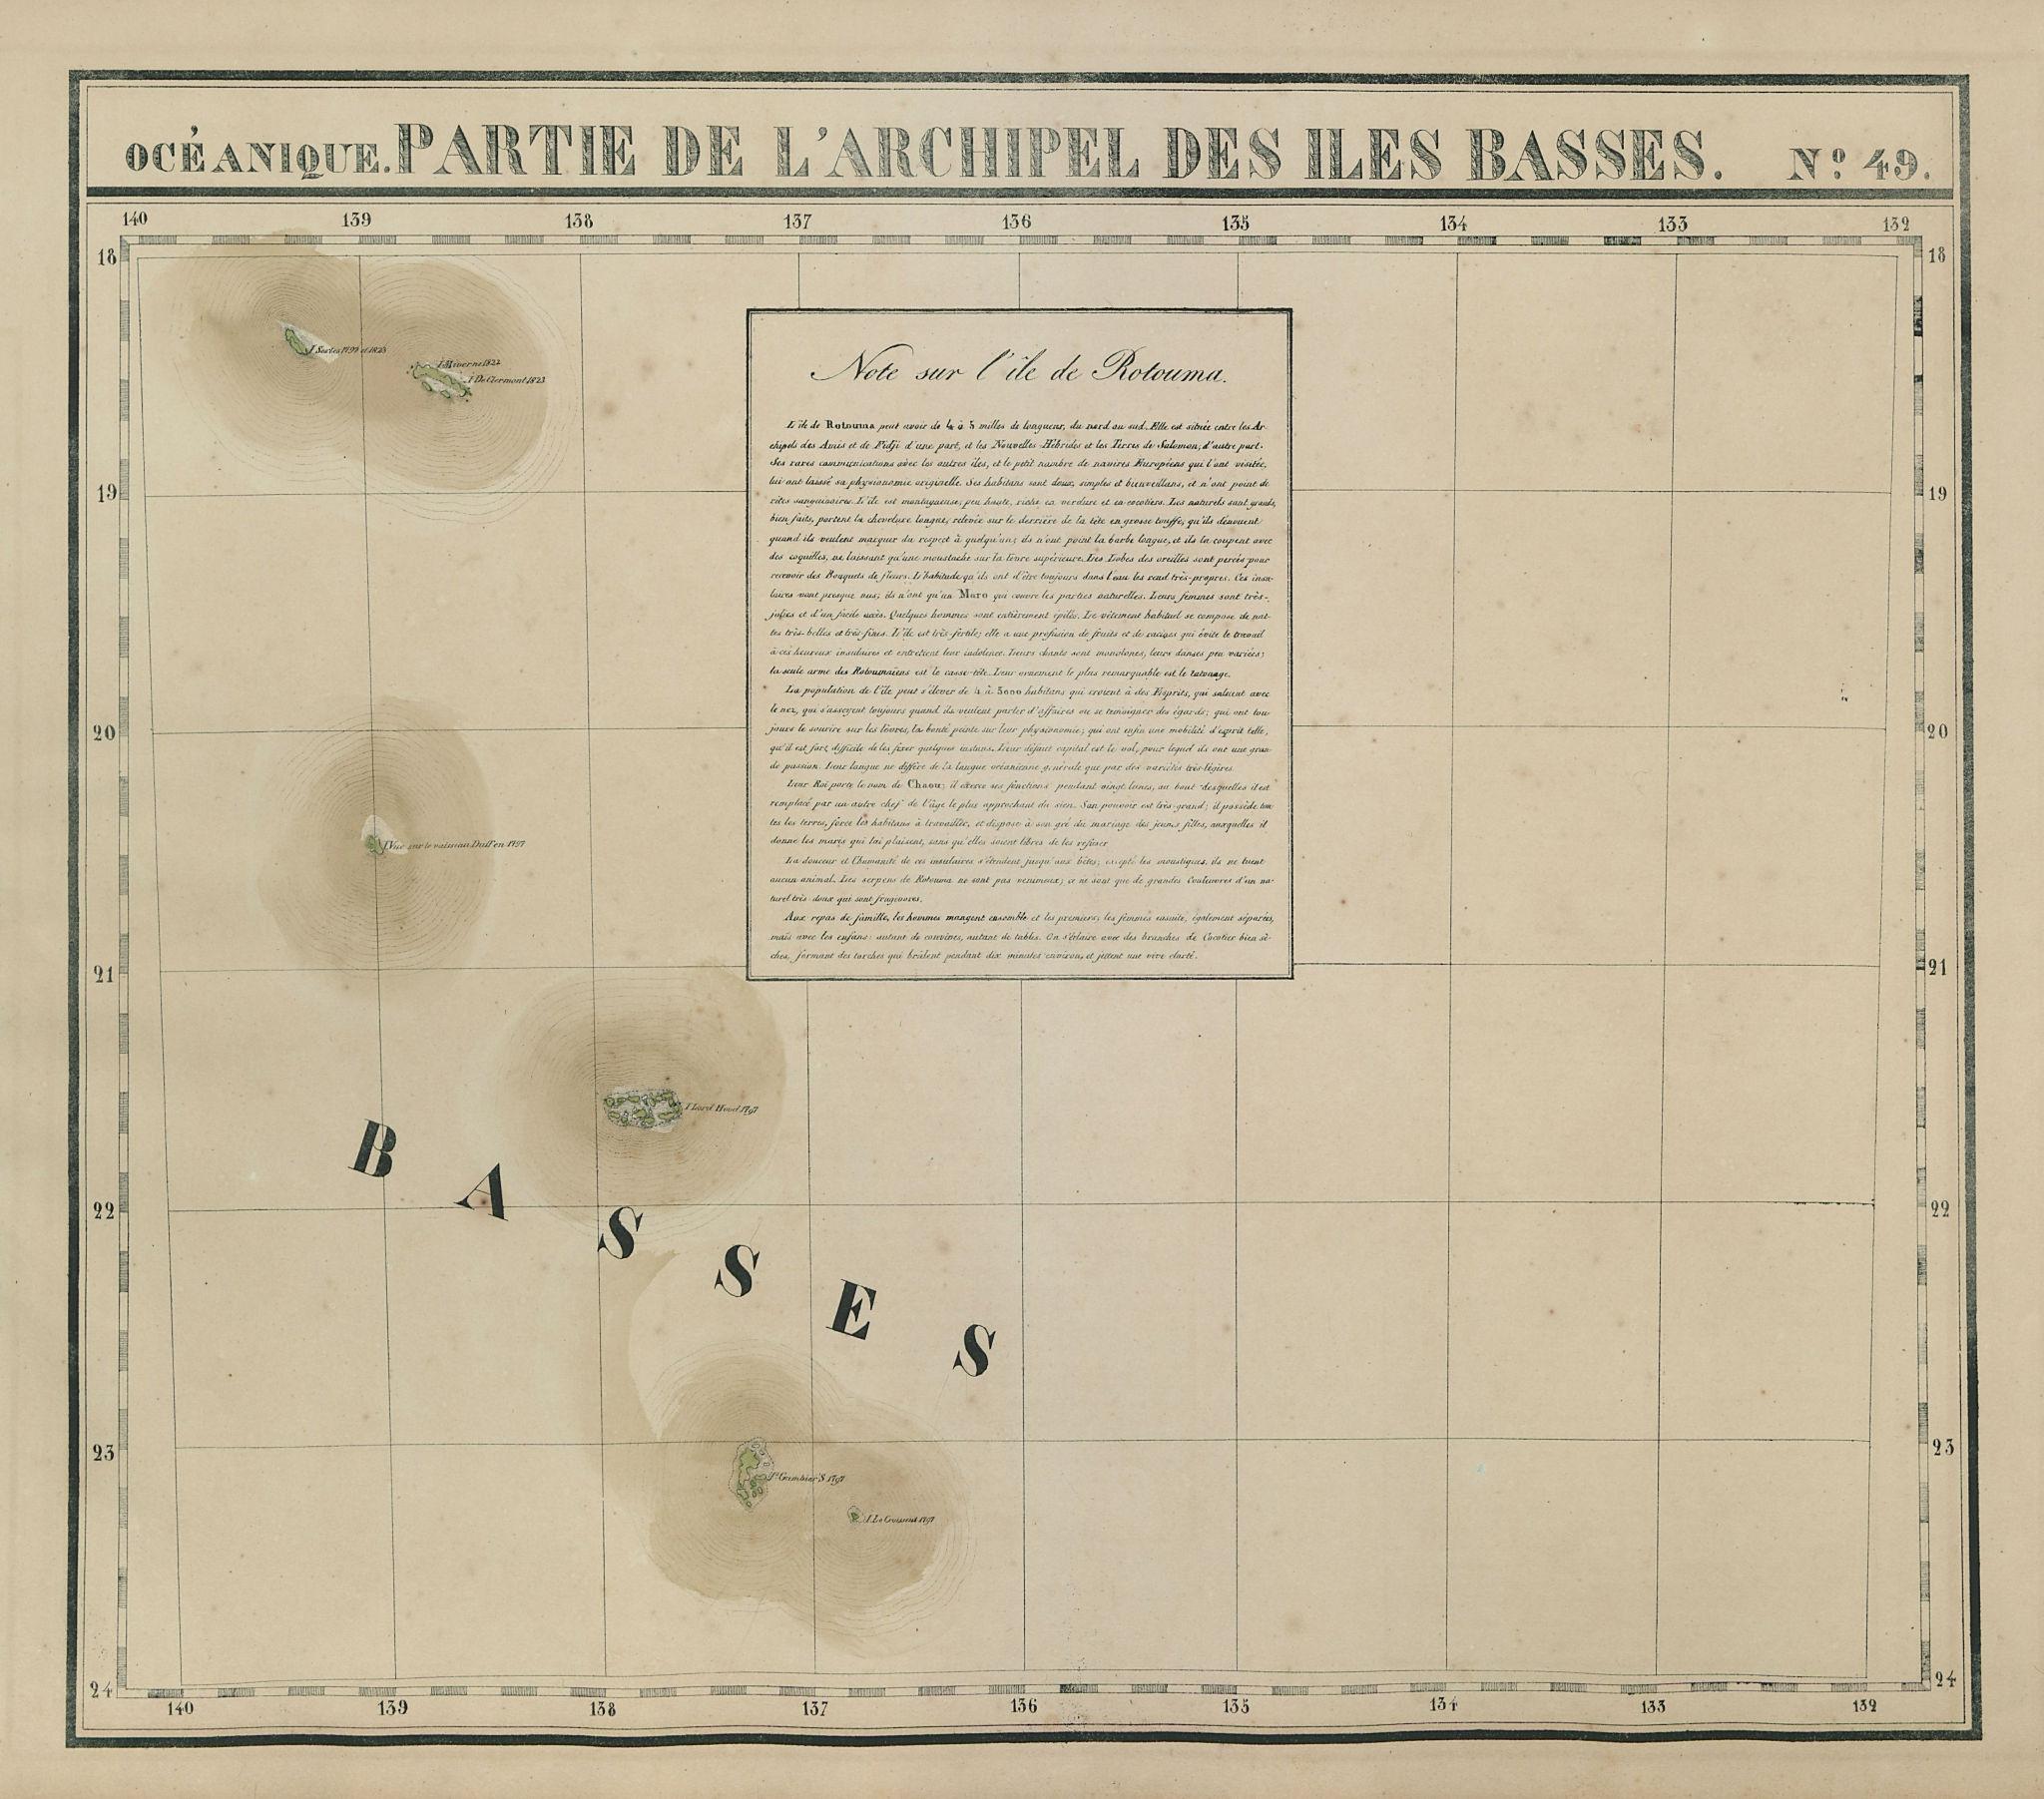 Océanique. Partie… des Iles Basses #49 Gambiers Polynesia. VANDERMAELEN 1827 map